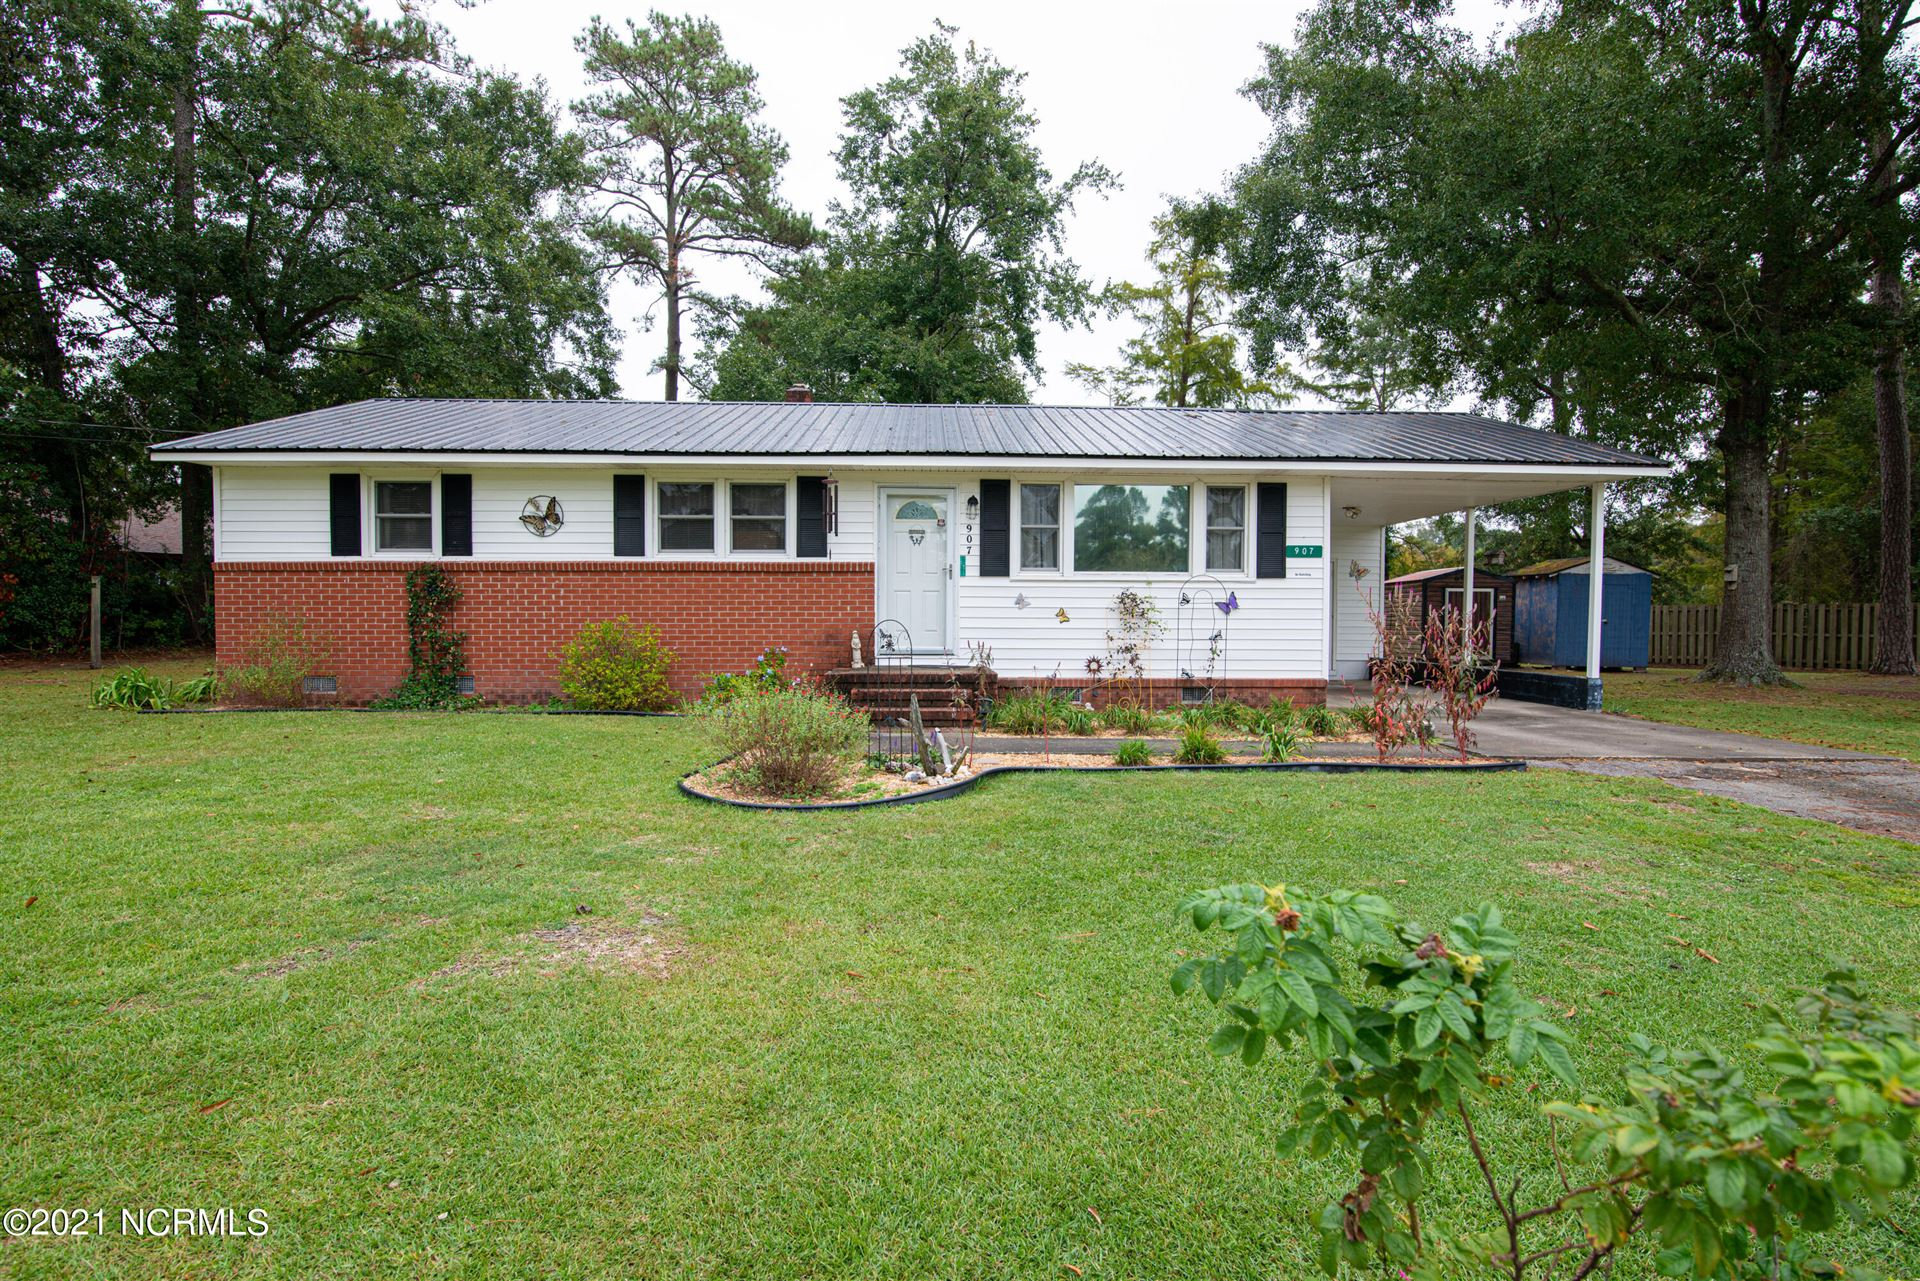 Photo of 907 Wood Drive, Richlands, NC 28574 (MLS # 100294432)